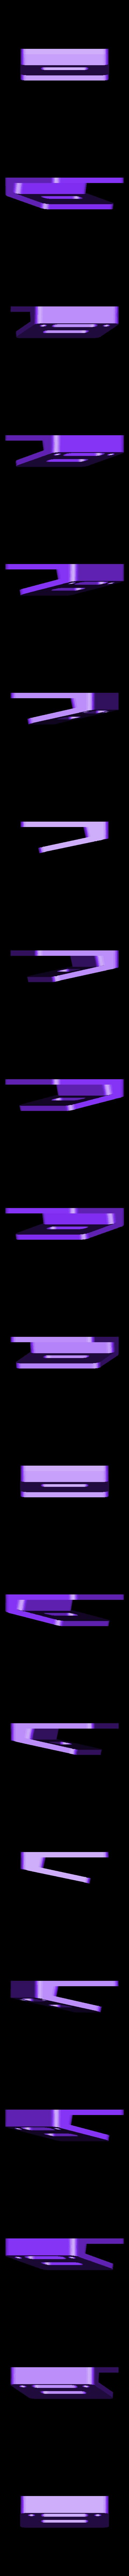 Laptop_Monitor_Mount_-_Vesa_75.stl Download free STL file Monitor Laptop Stand - Vesa Mount 100 & 75 • 3D printer object, FedorSosnin